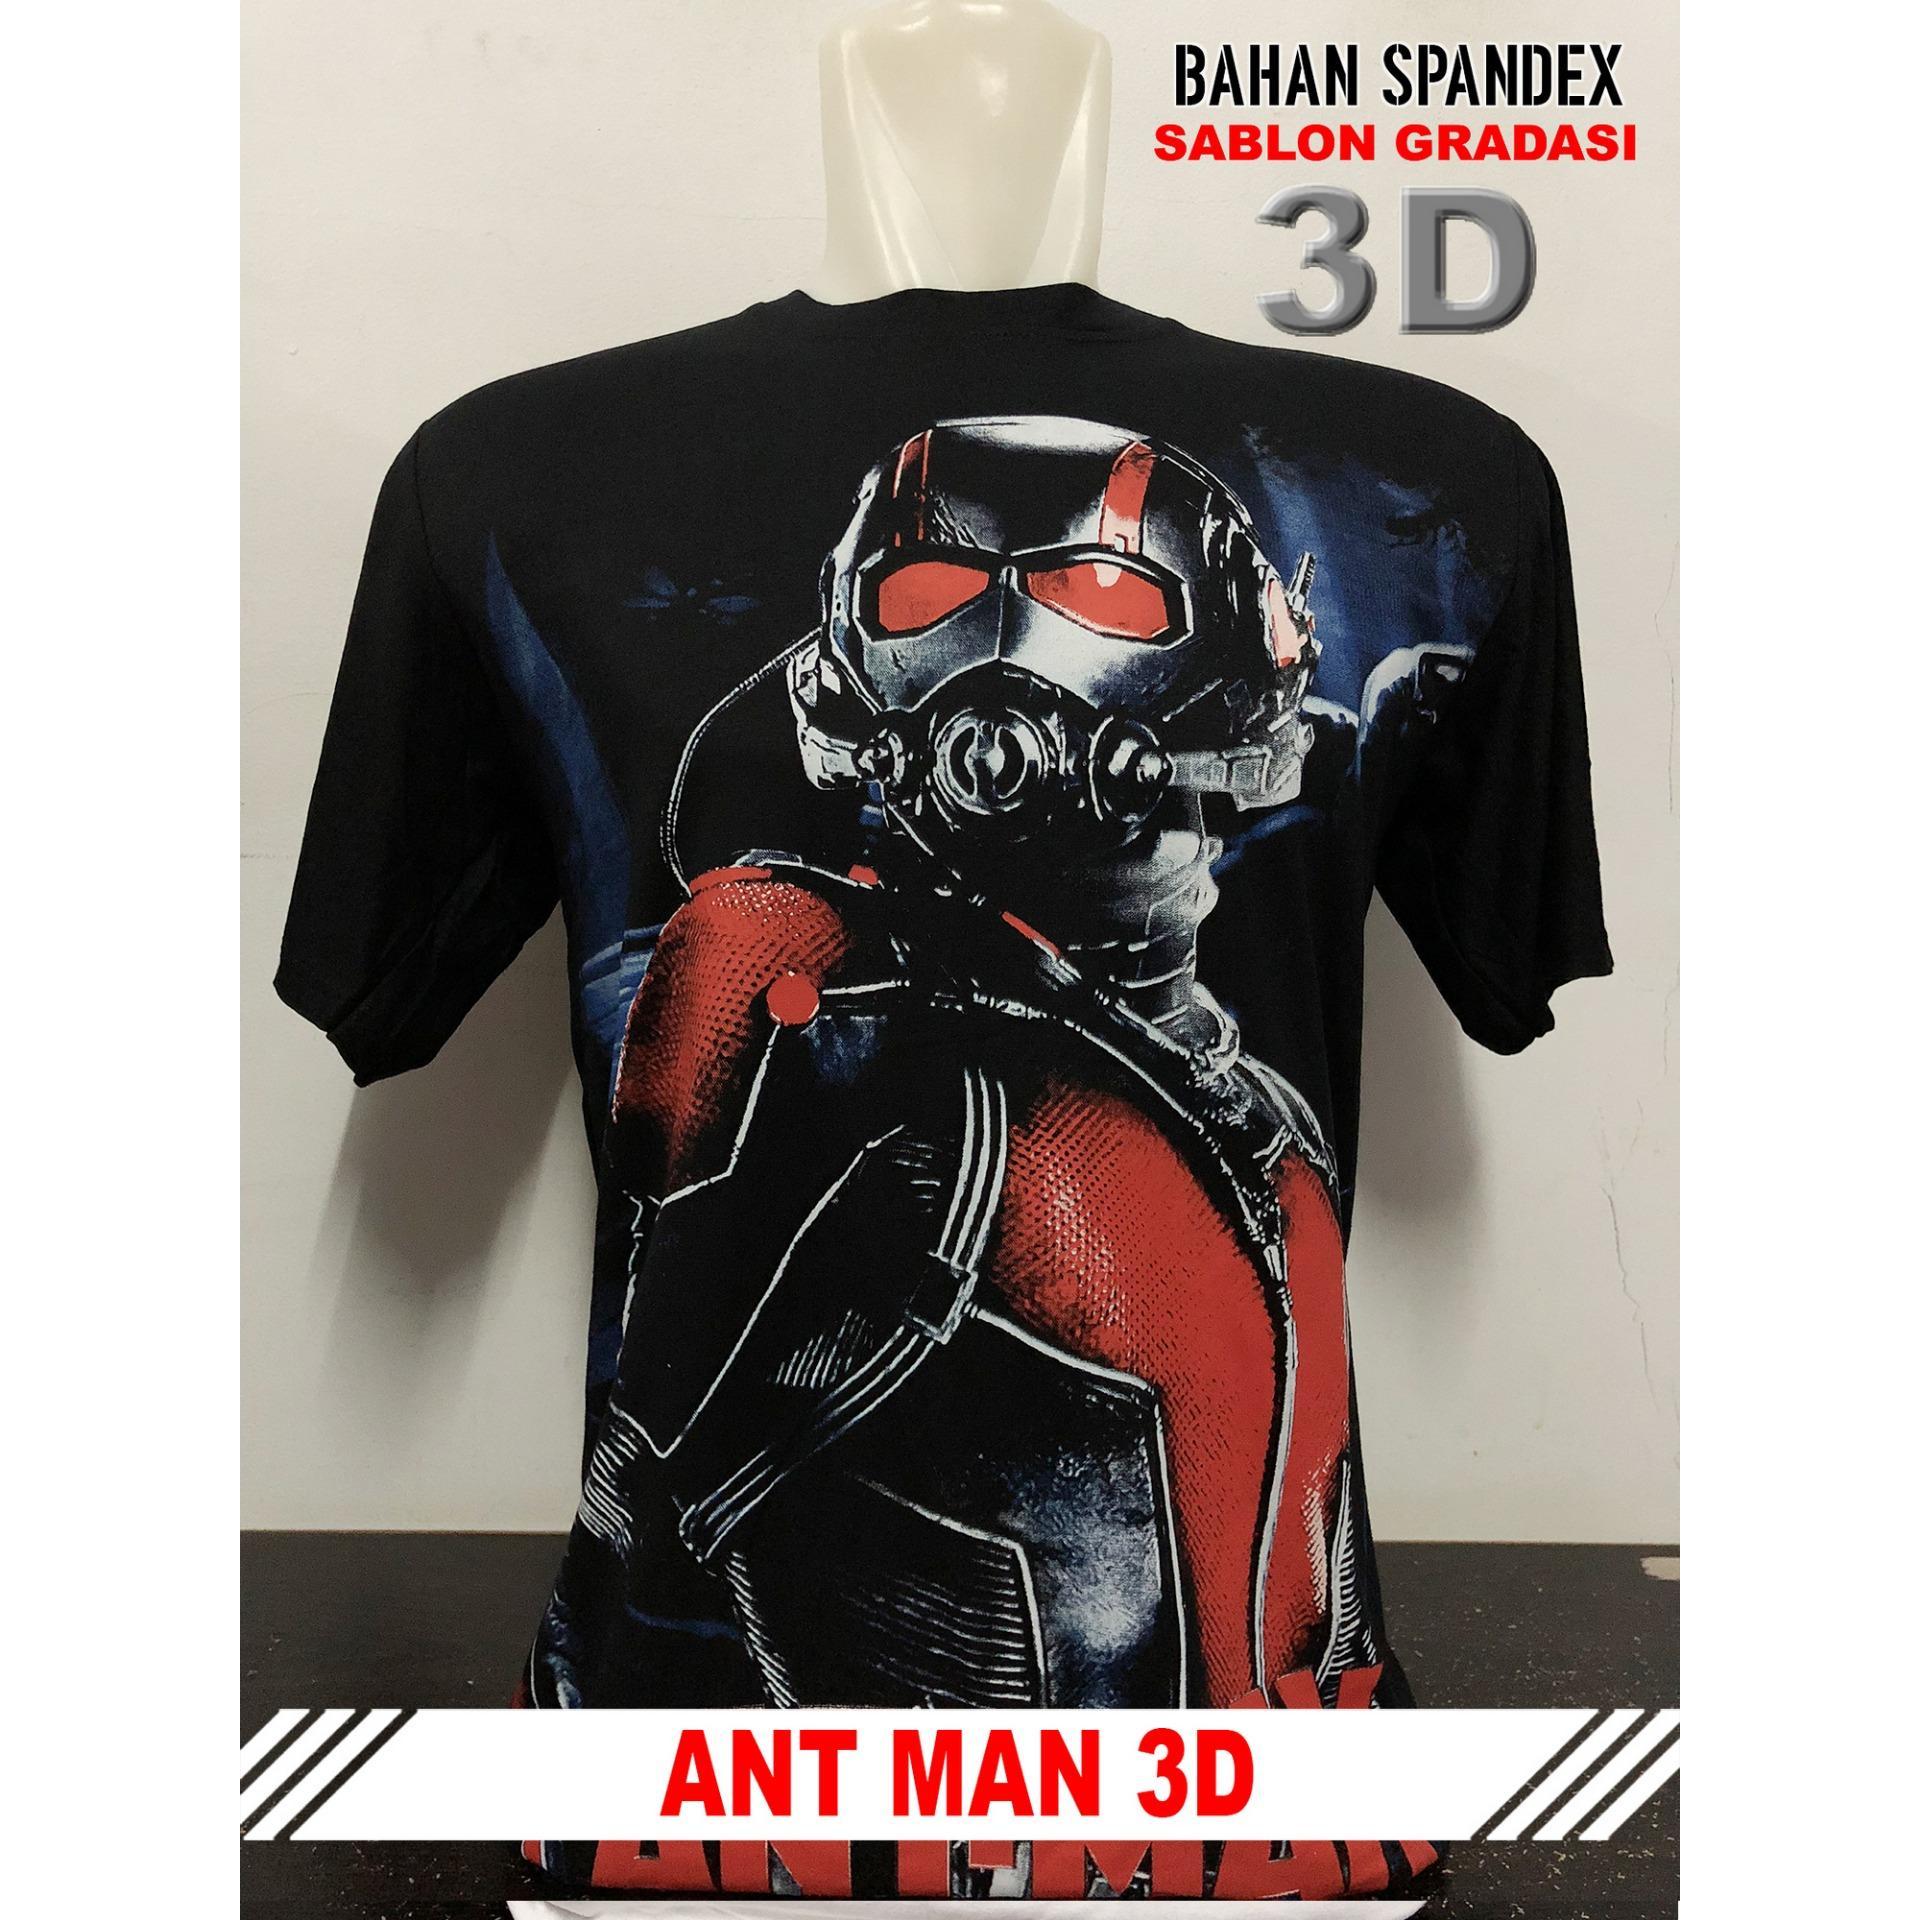 Anime ID - Kaos T-Shirt Distro / kaos Pria / Tshirt Pria / Distro Pria / Baju Pria 3D Ant Man - Hit